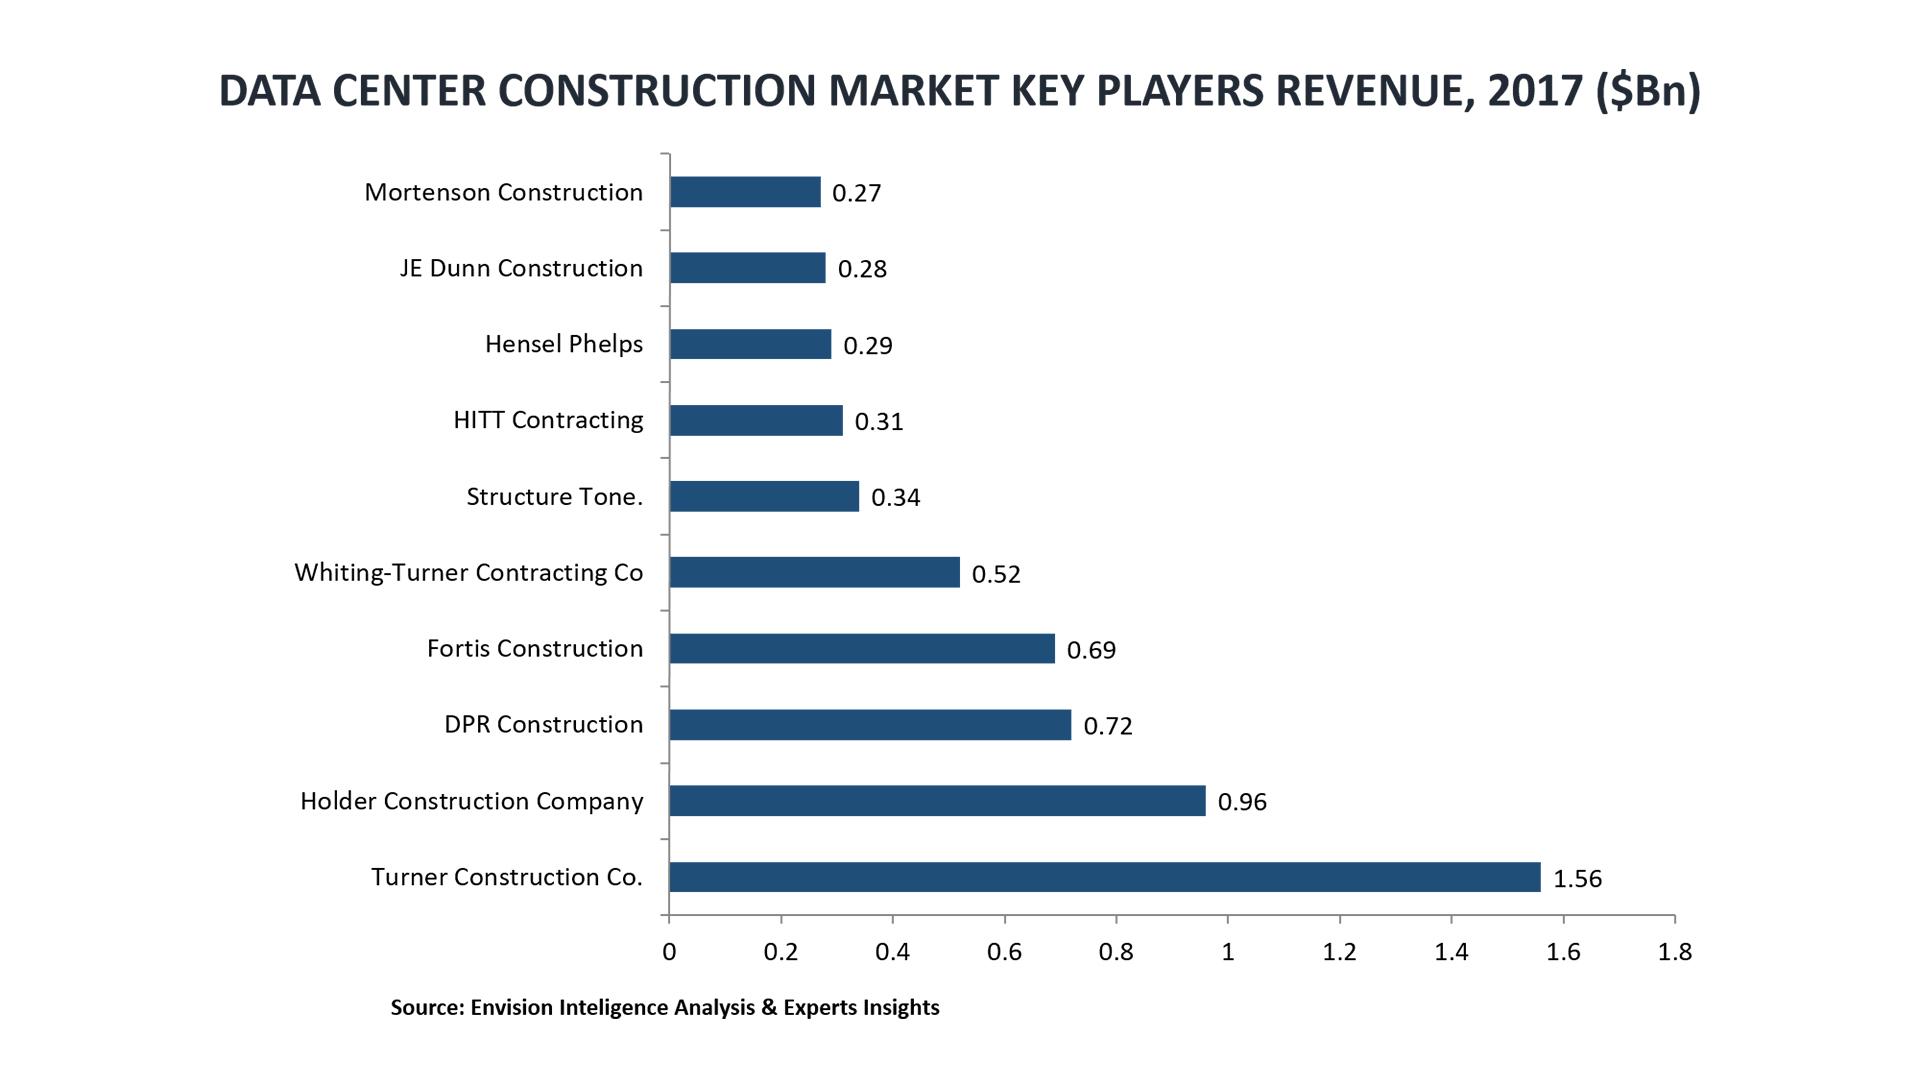 6.data center construction market size